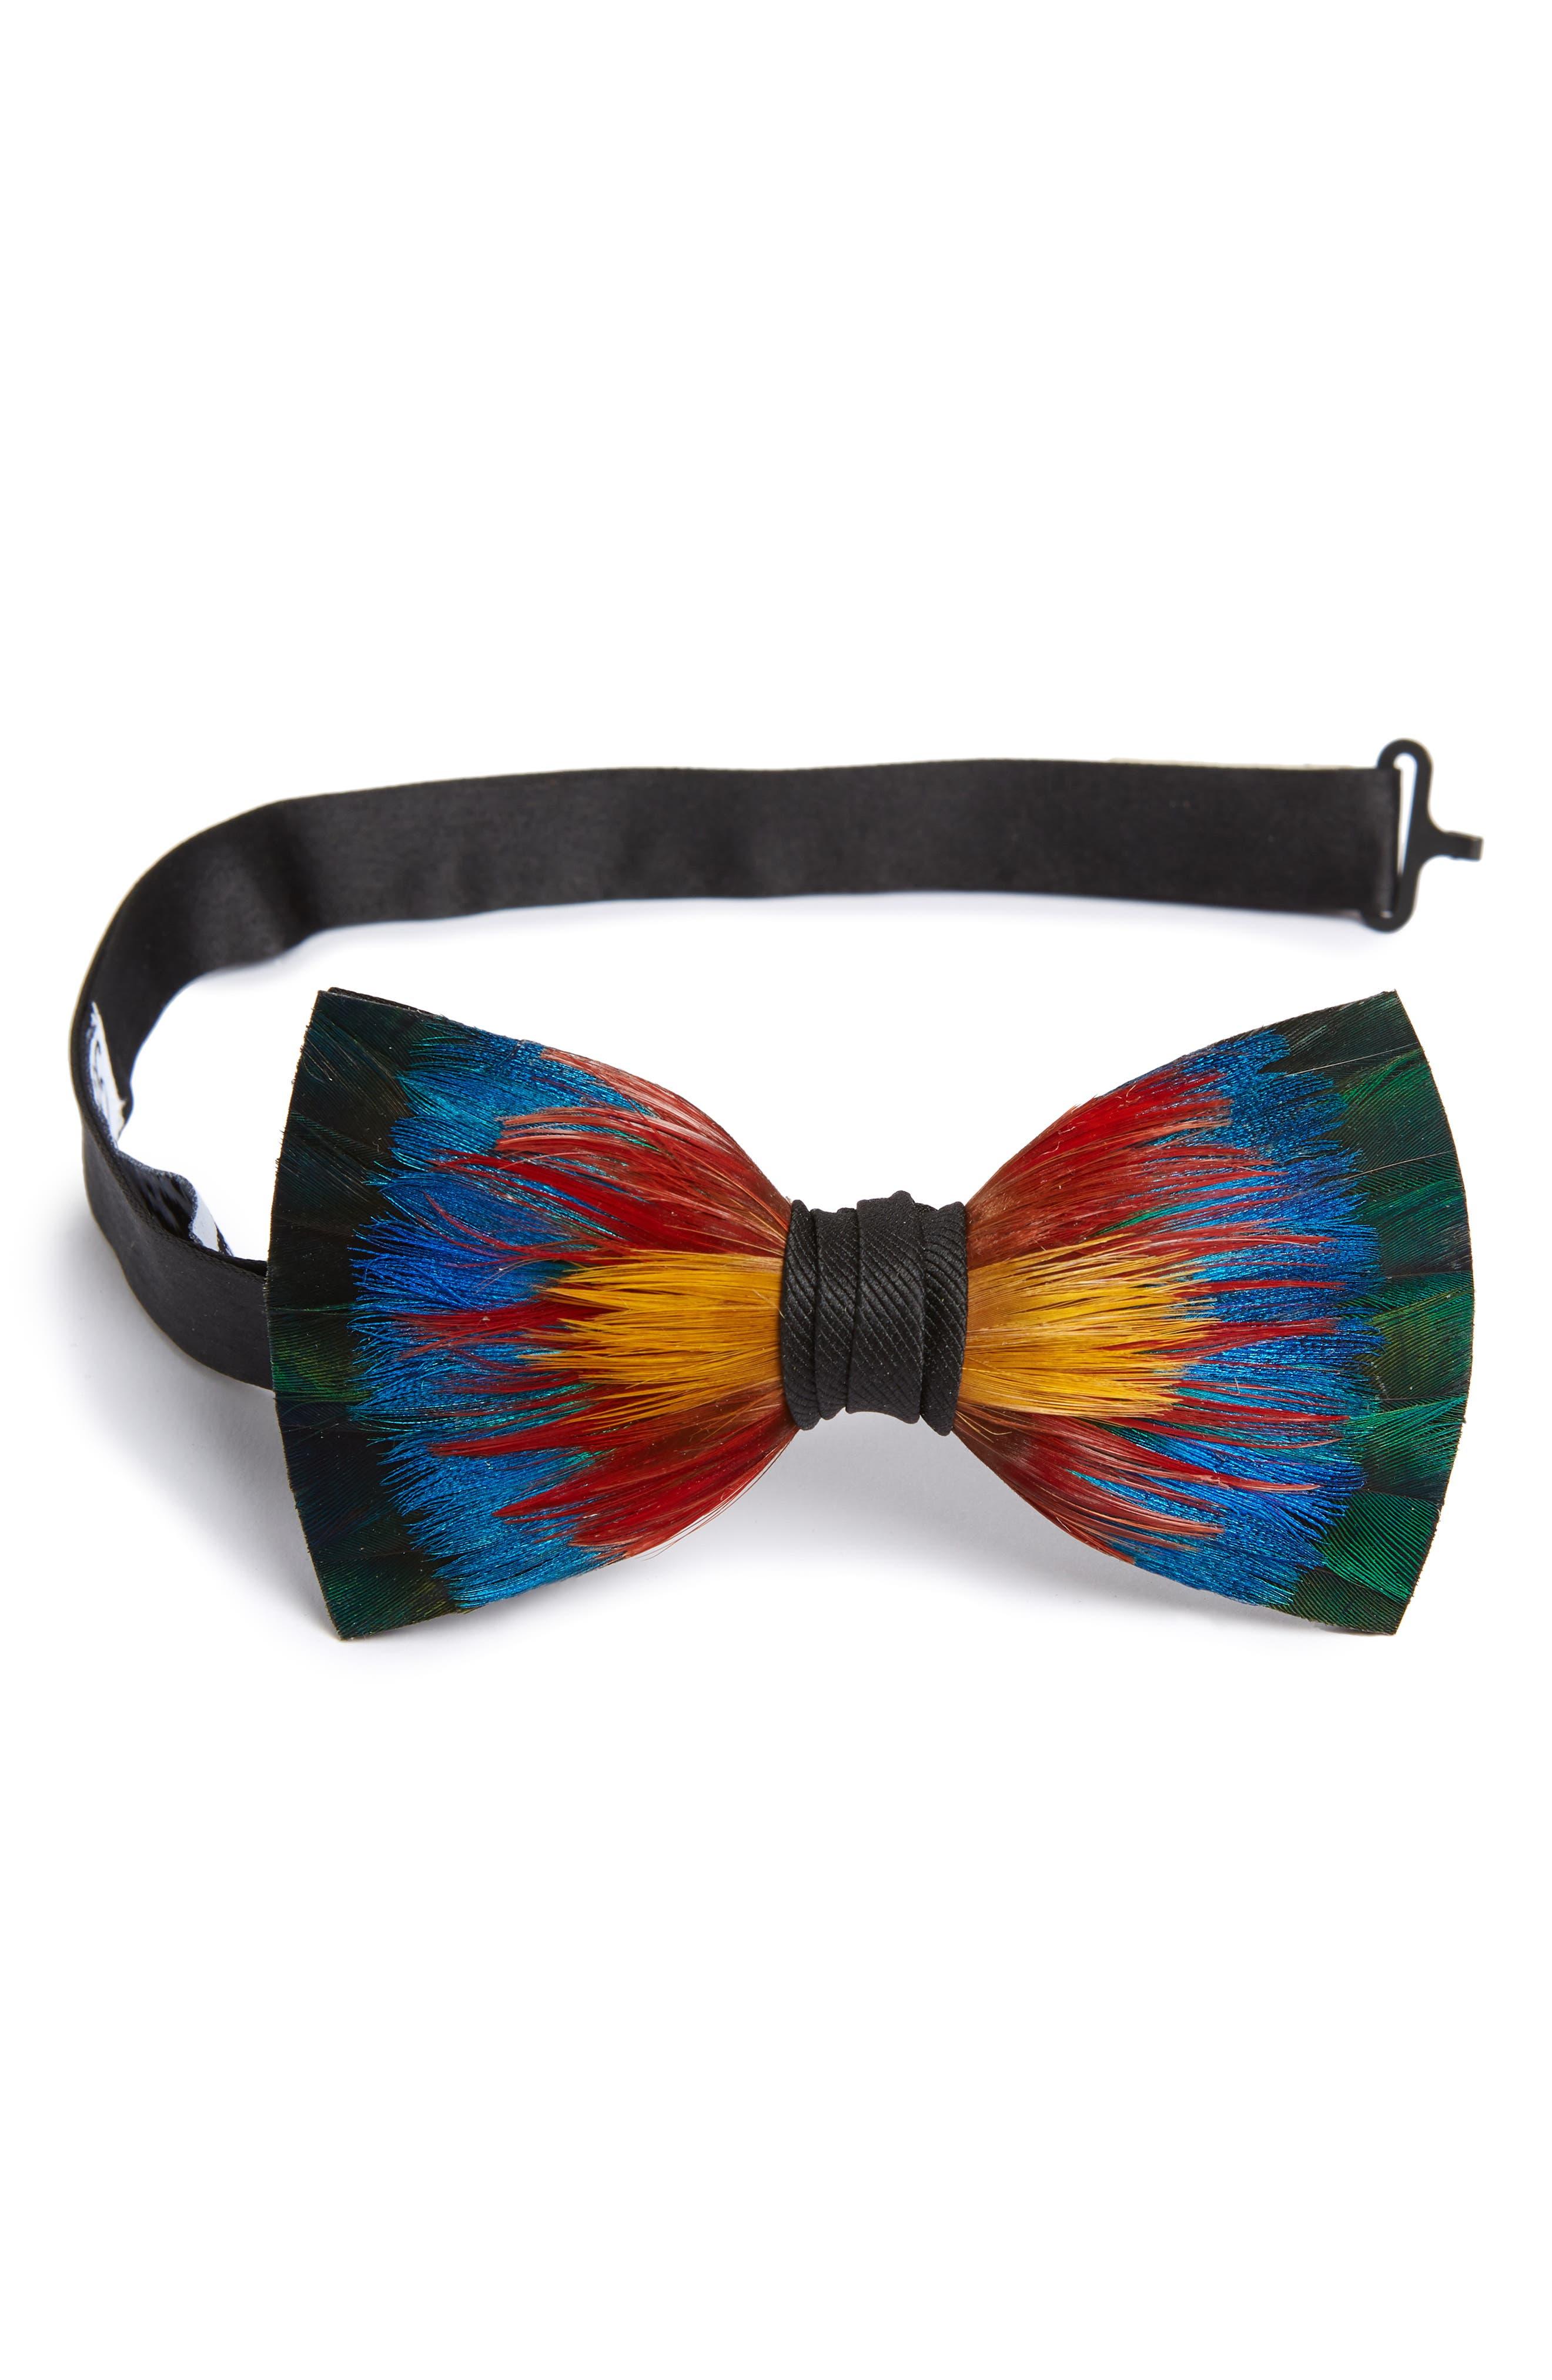 Spectrum Feather Bow Tie,                             Main thumbnail 1, color,                             BLUE